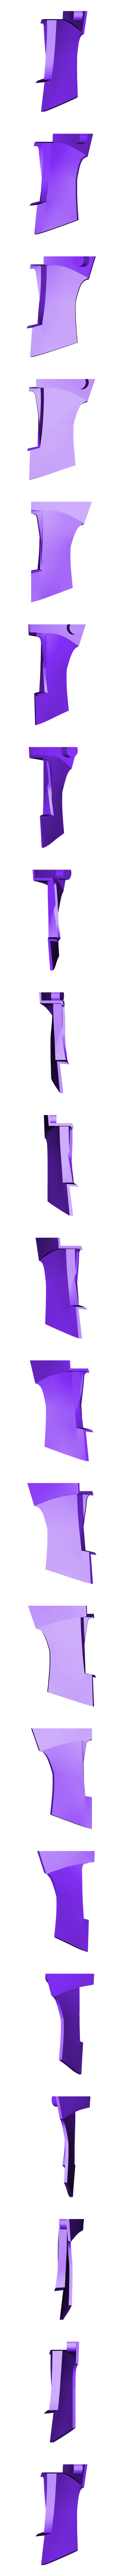 Part_6_v2_5.stl Download free STL file  Iron Musketeer's Helmet (Final Fantasy XI) • 3D printable design, VillainousPropShop